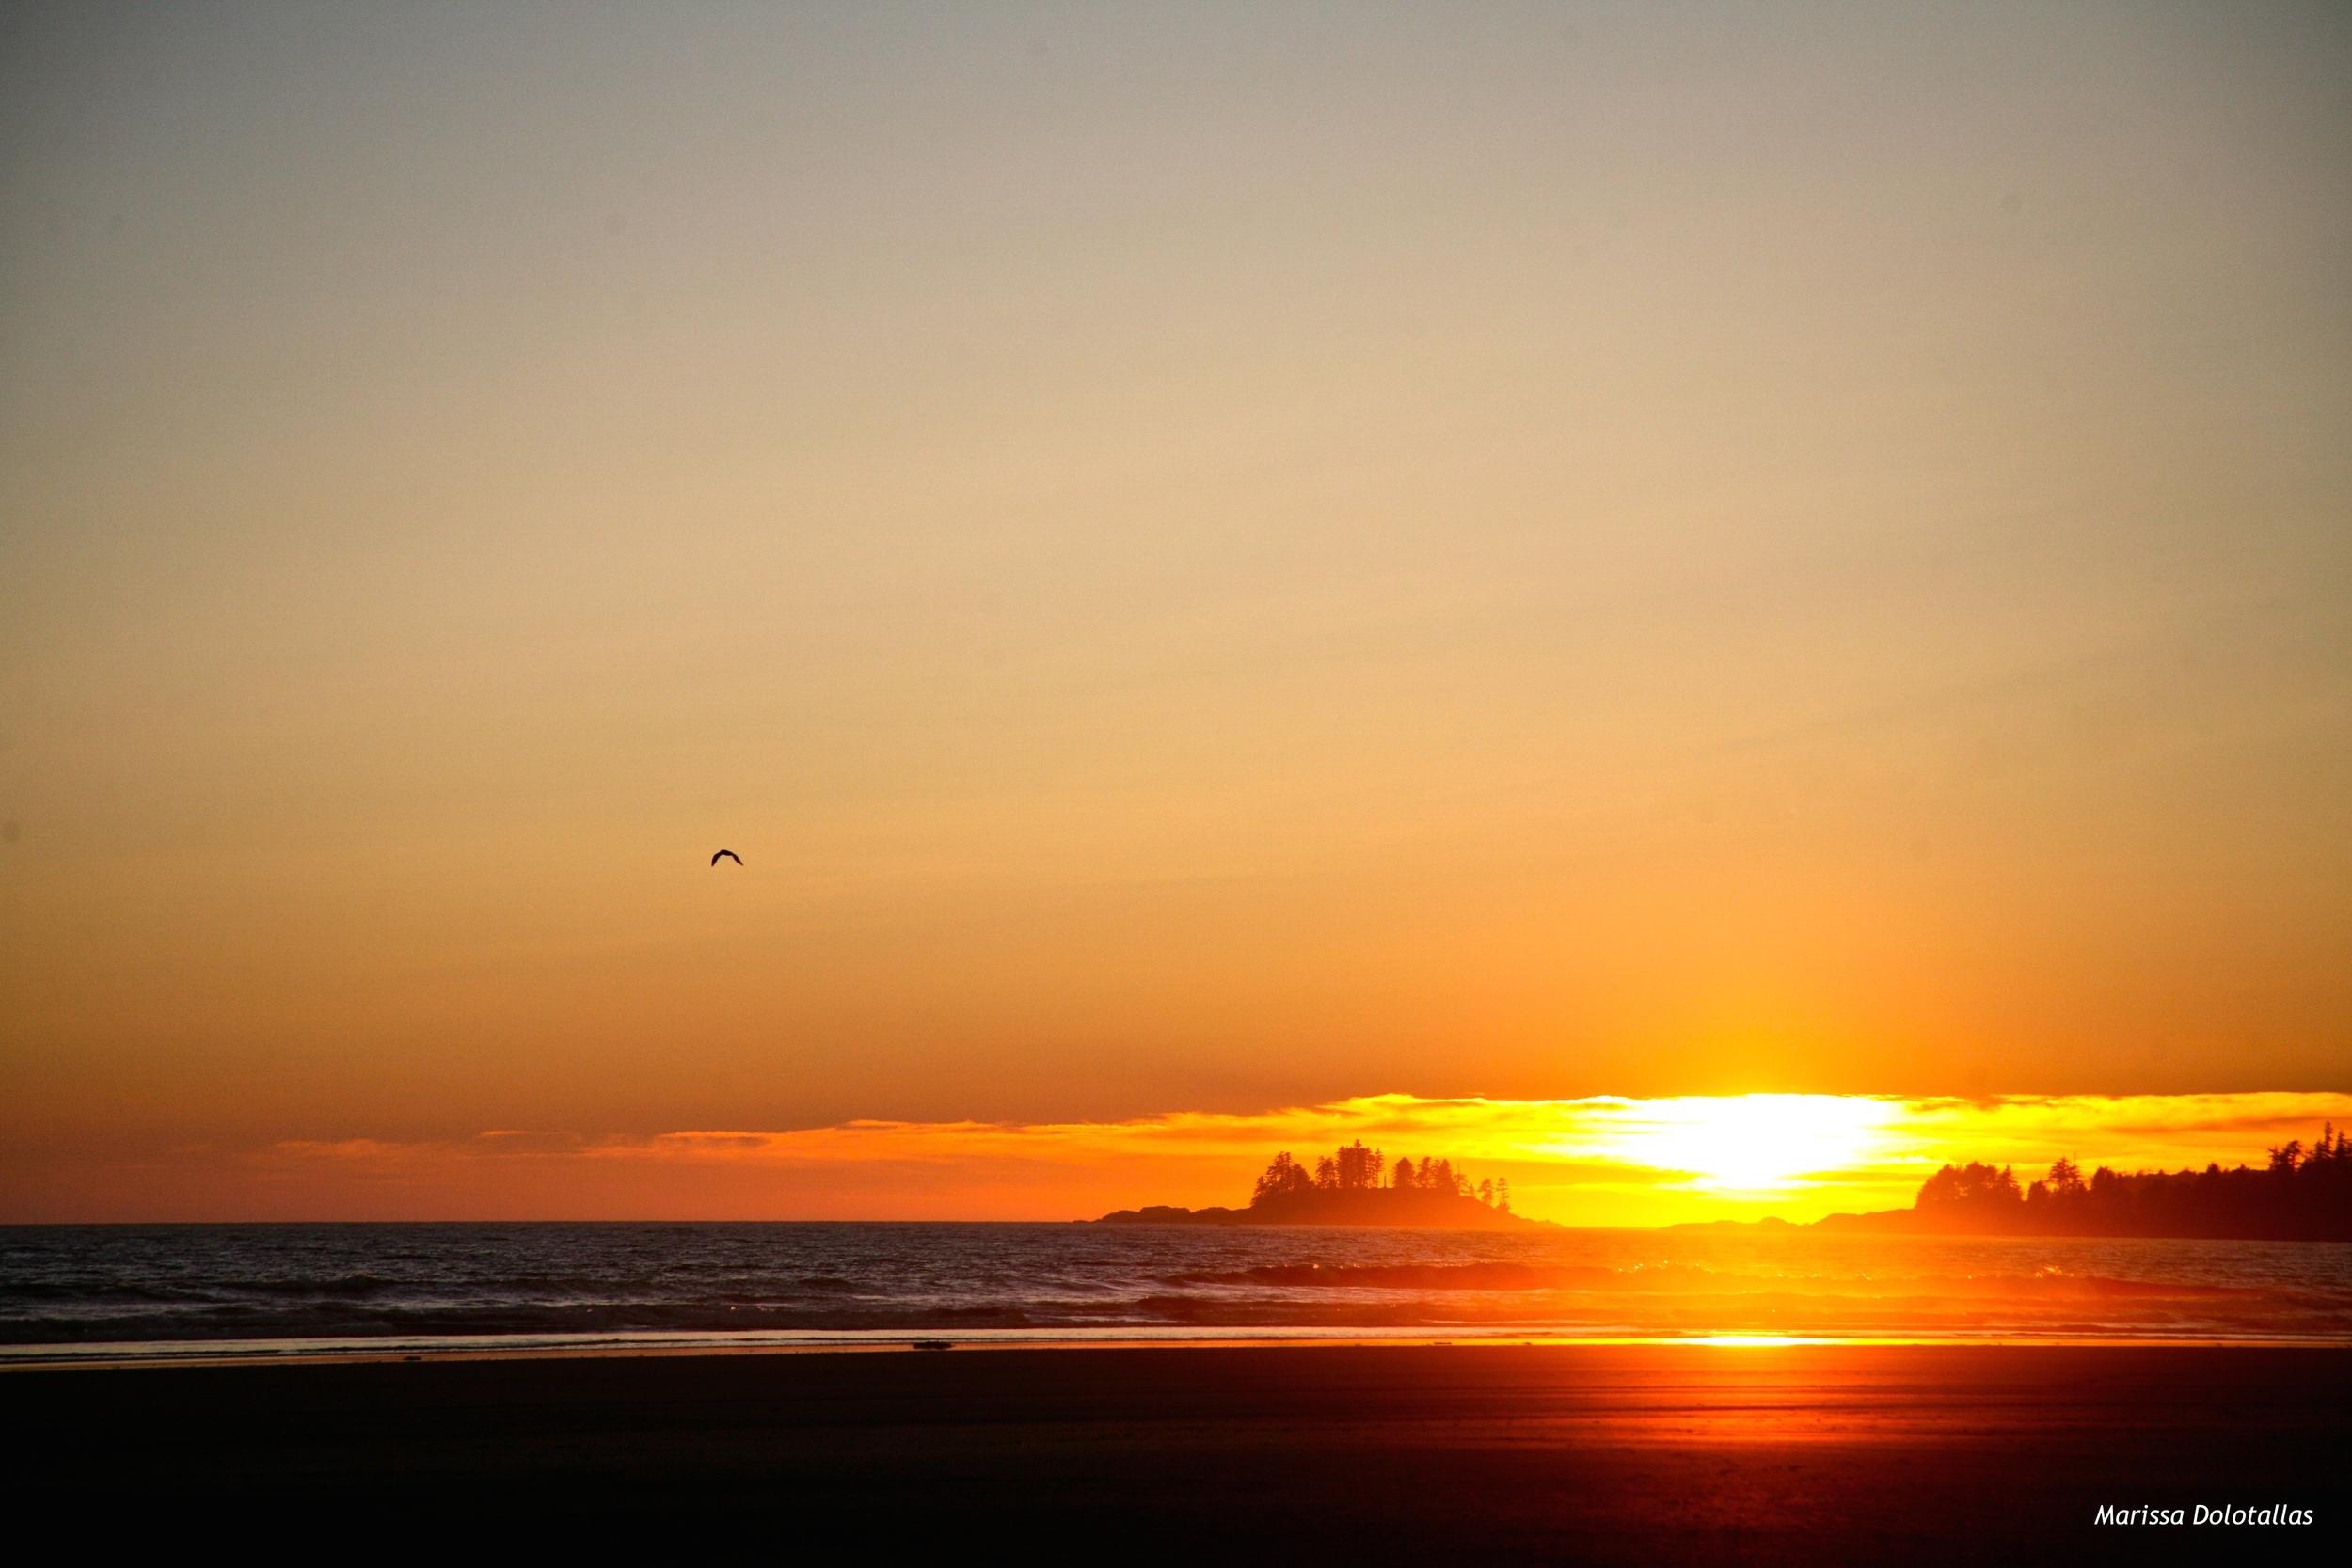 Sunset in Tofino, BC